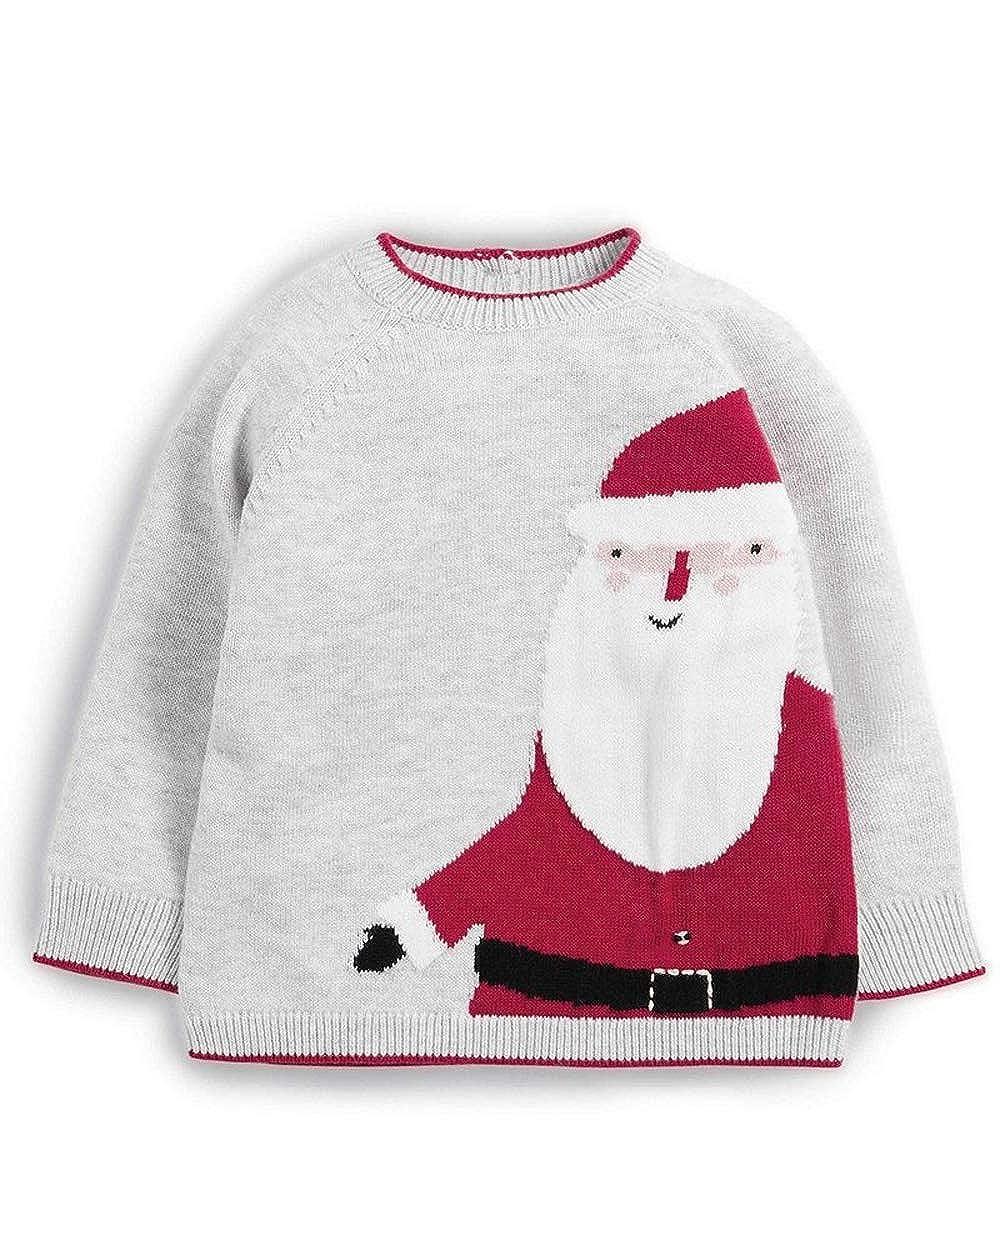 Mamas & Papas Knitted Christmas Santa Claus Grey Jumper 100% Cotton - 3-6 Months